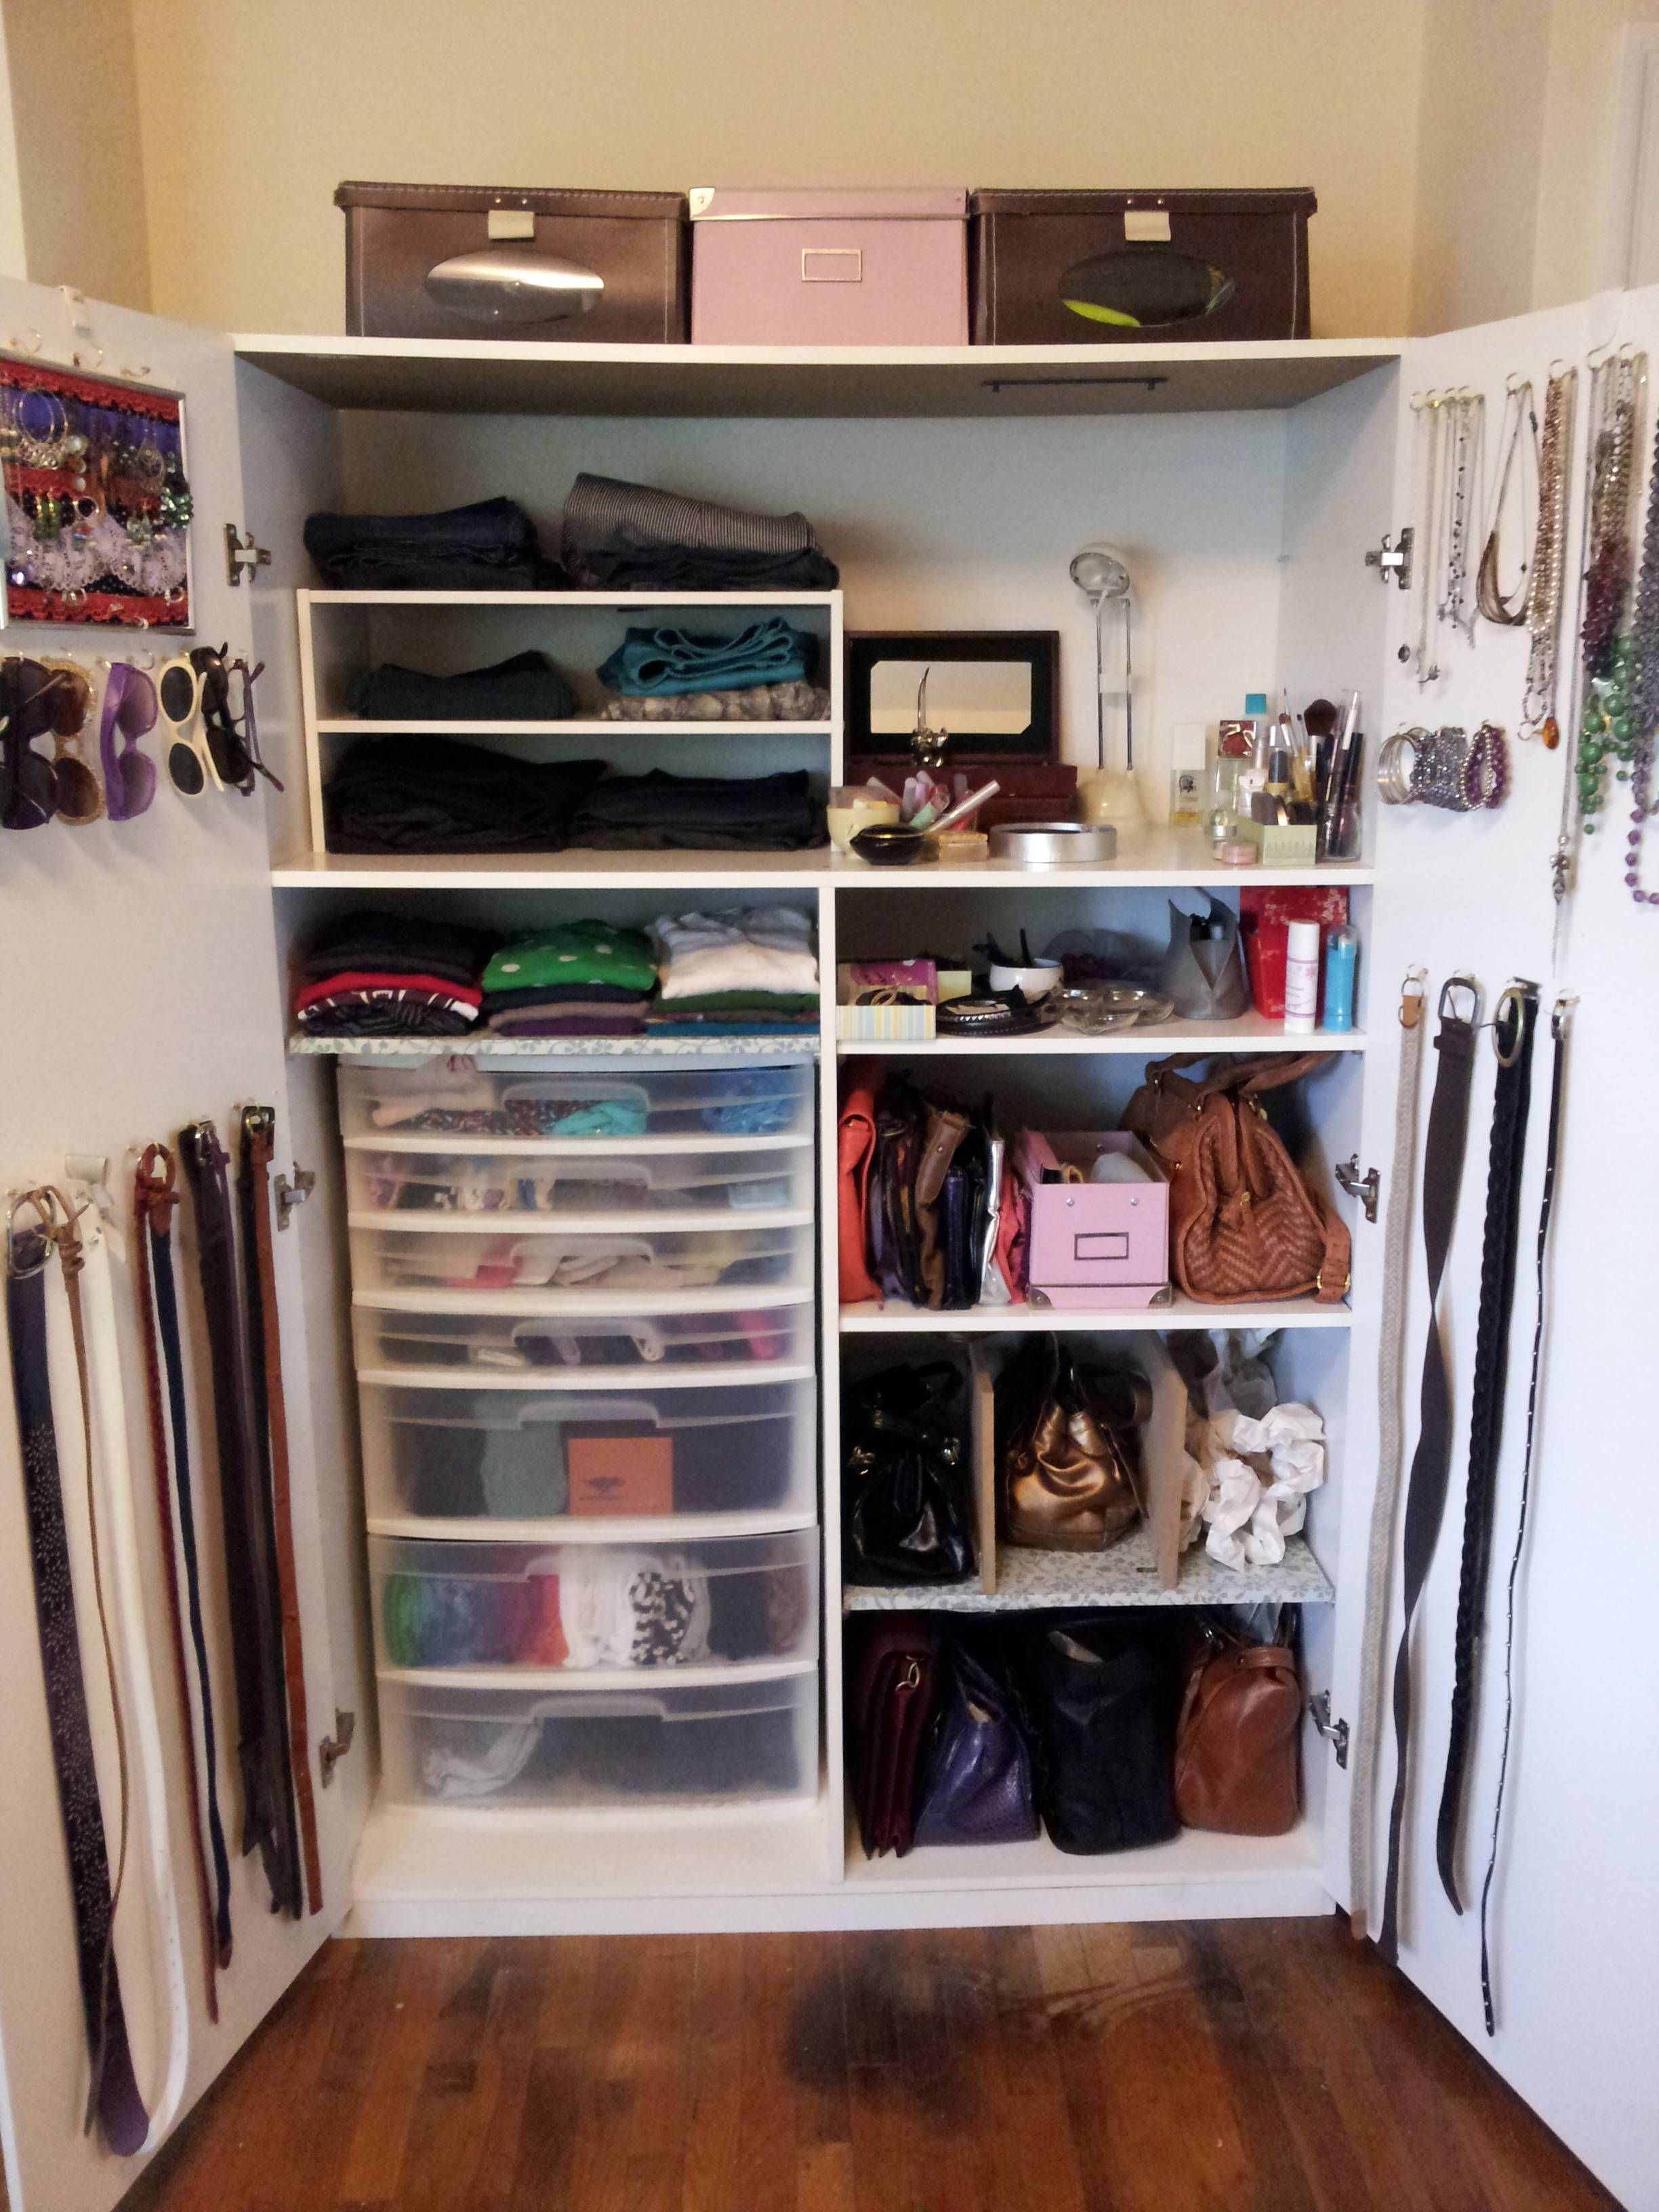 Closet Organization Small Bedroom Closet Storage Ideas Small Closet Space Closet Small Bedroom